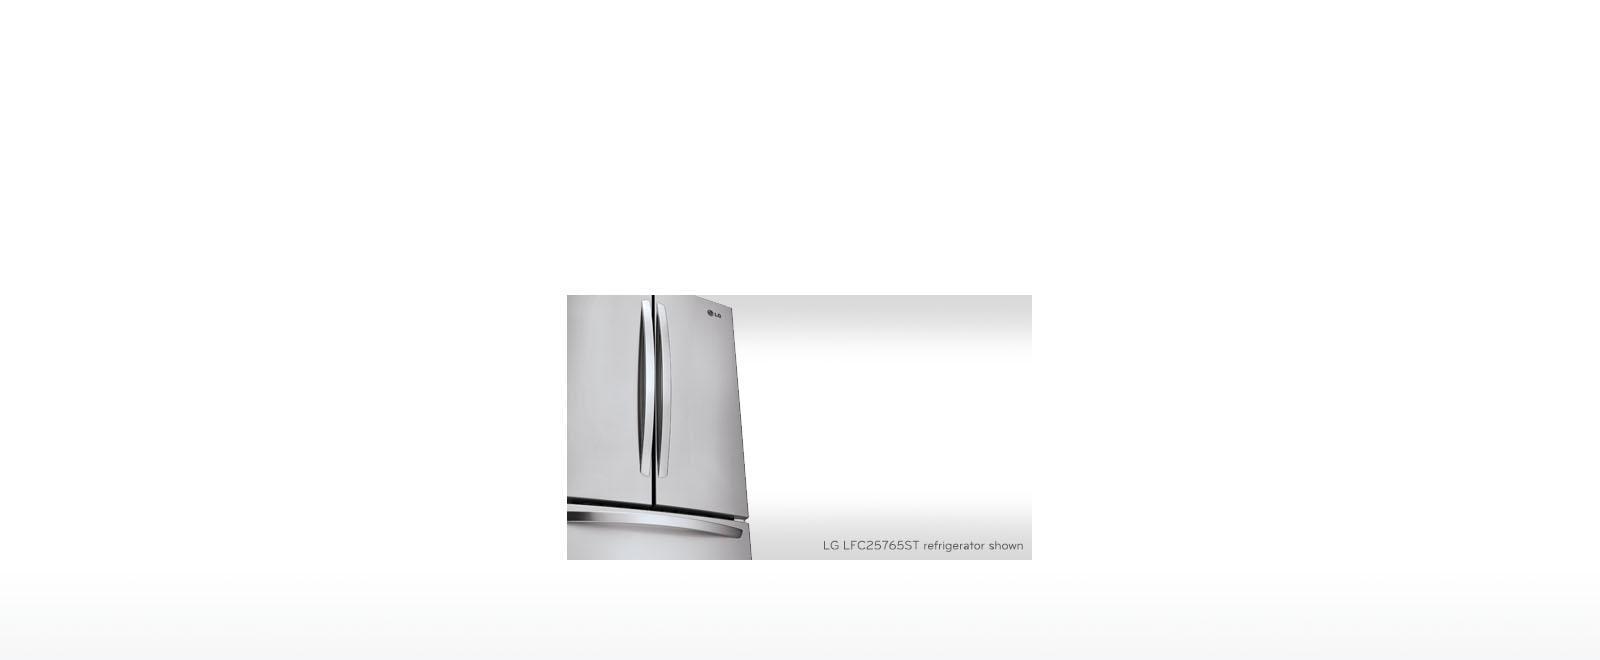 Lg Ldcs24223w Large 33 Inch Wide Bottom Freezer